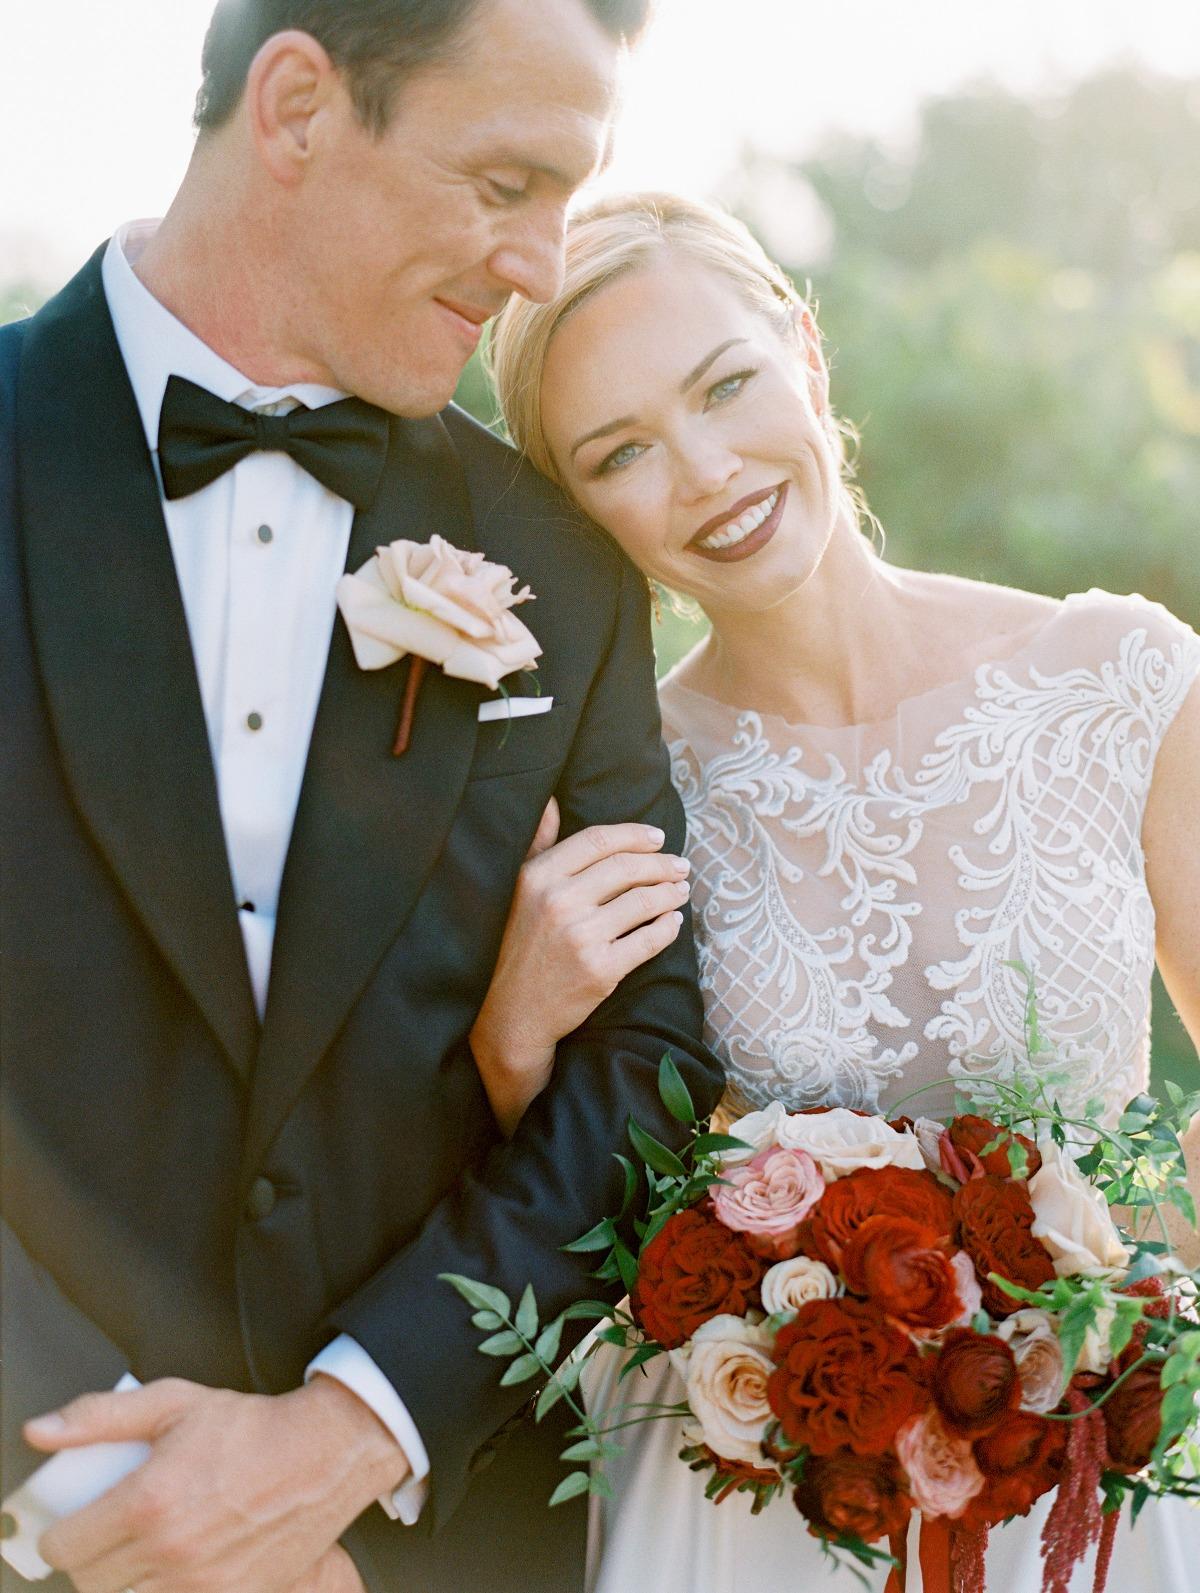 temecula-wedding-planner13.jpg